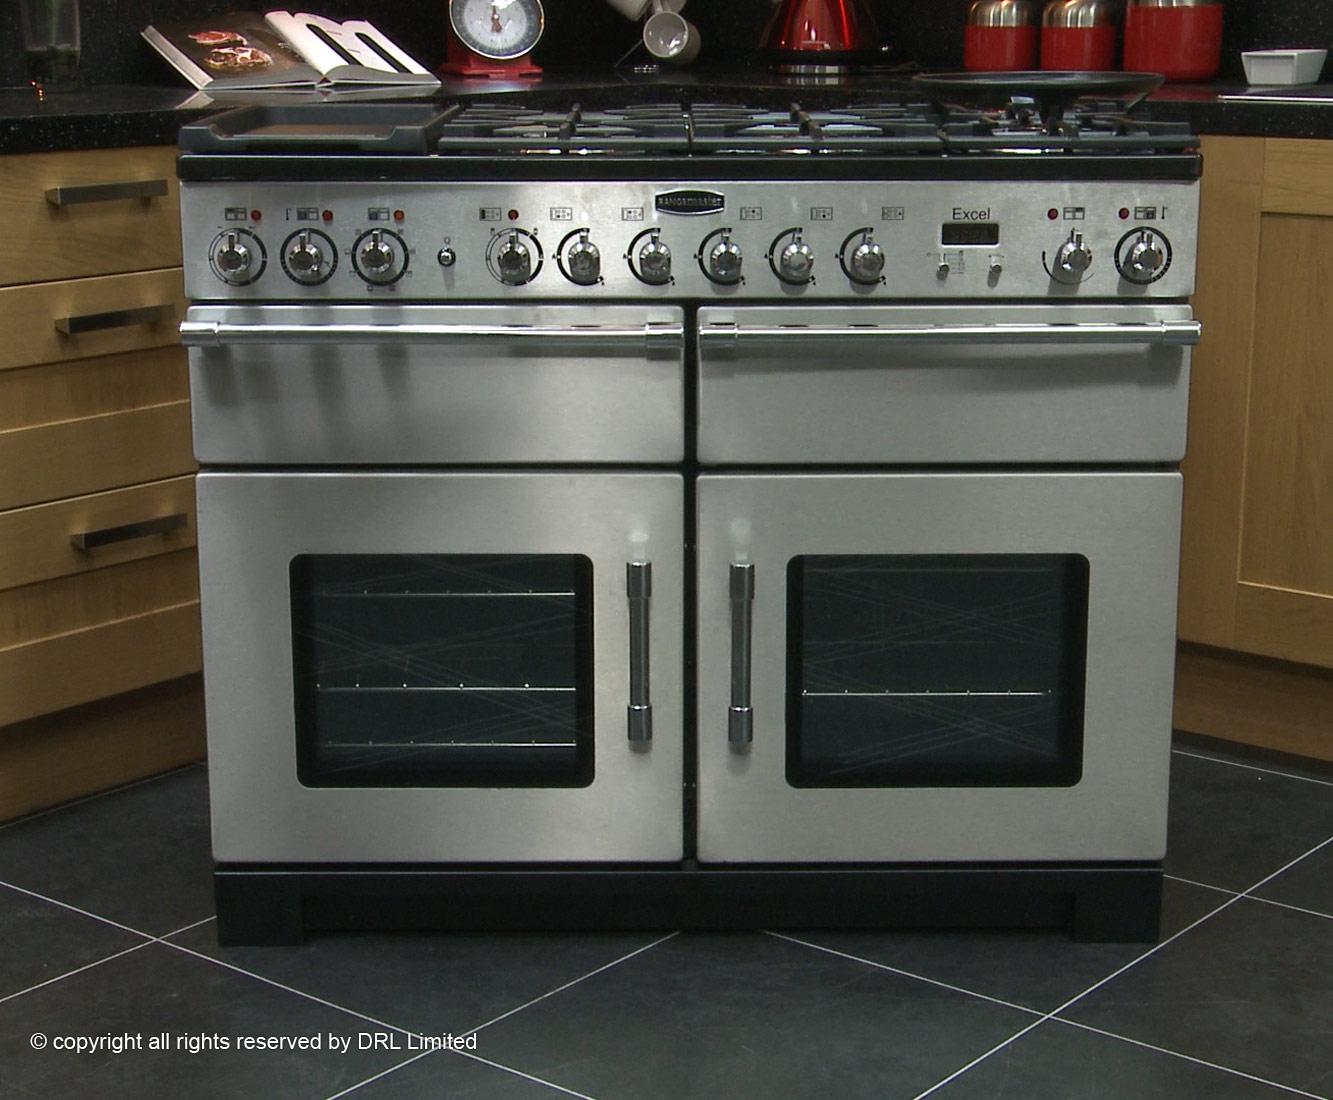 boots kitchen appliances washing machines fridges more. Black Bedroom Furniture Sets. Home Design Ideas